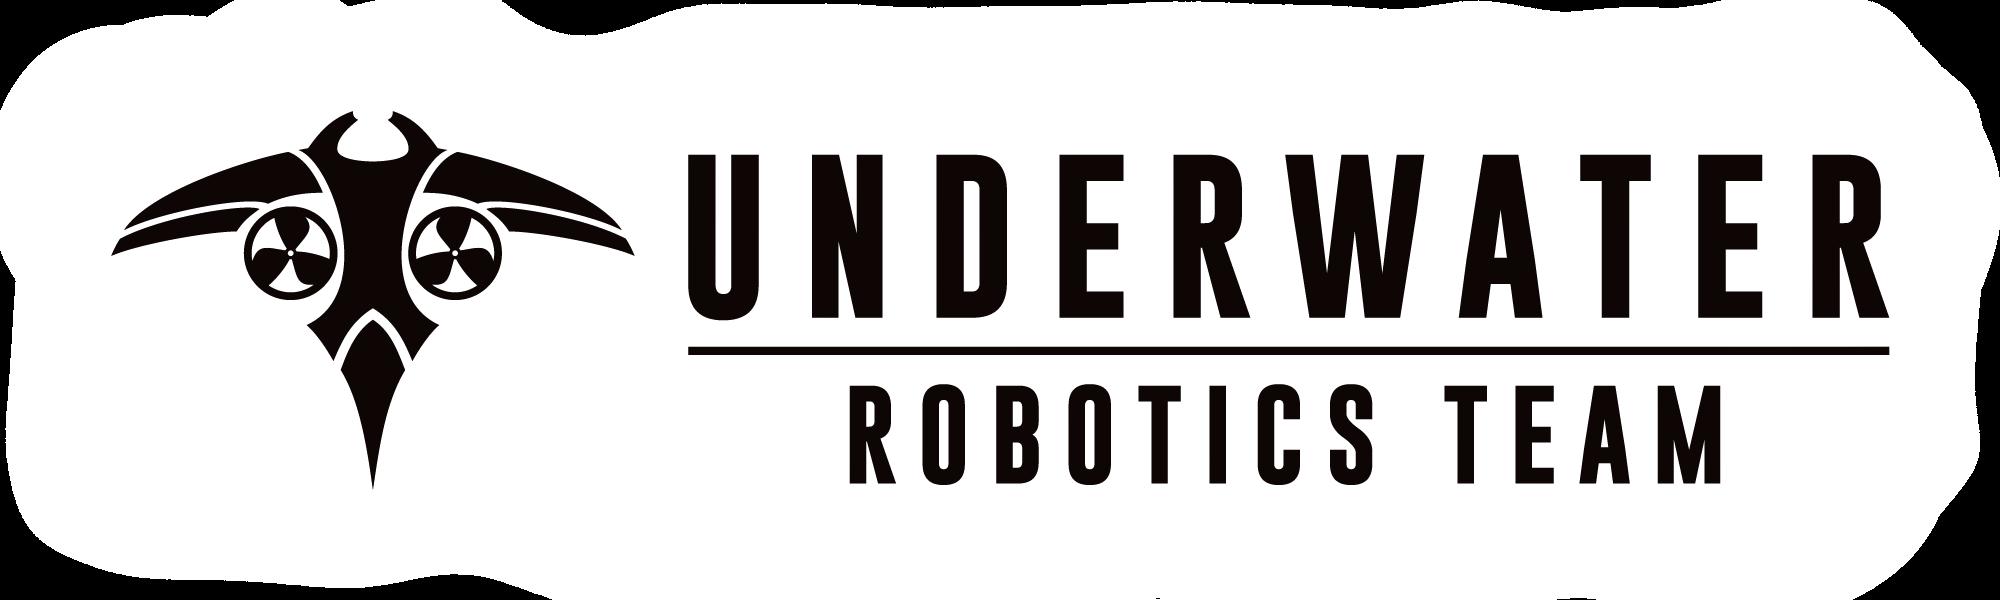 Missouri S&T Underwater Robotics